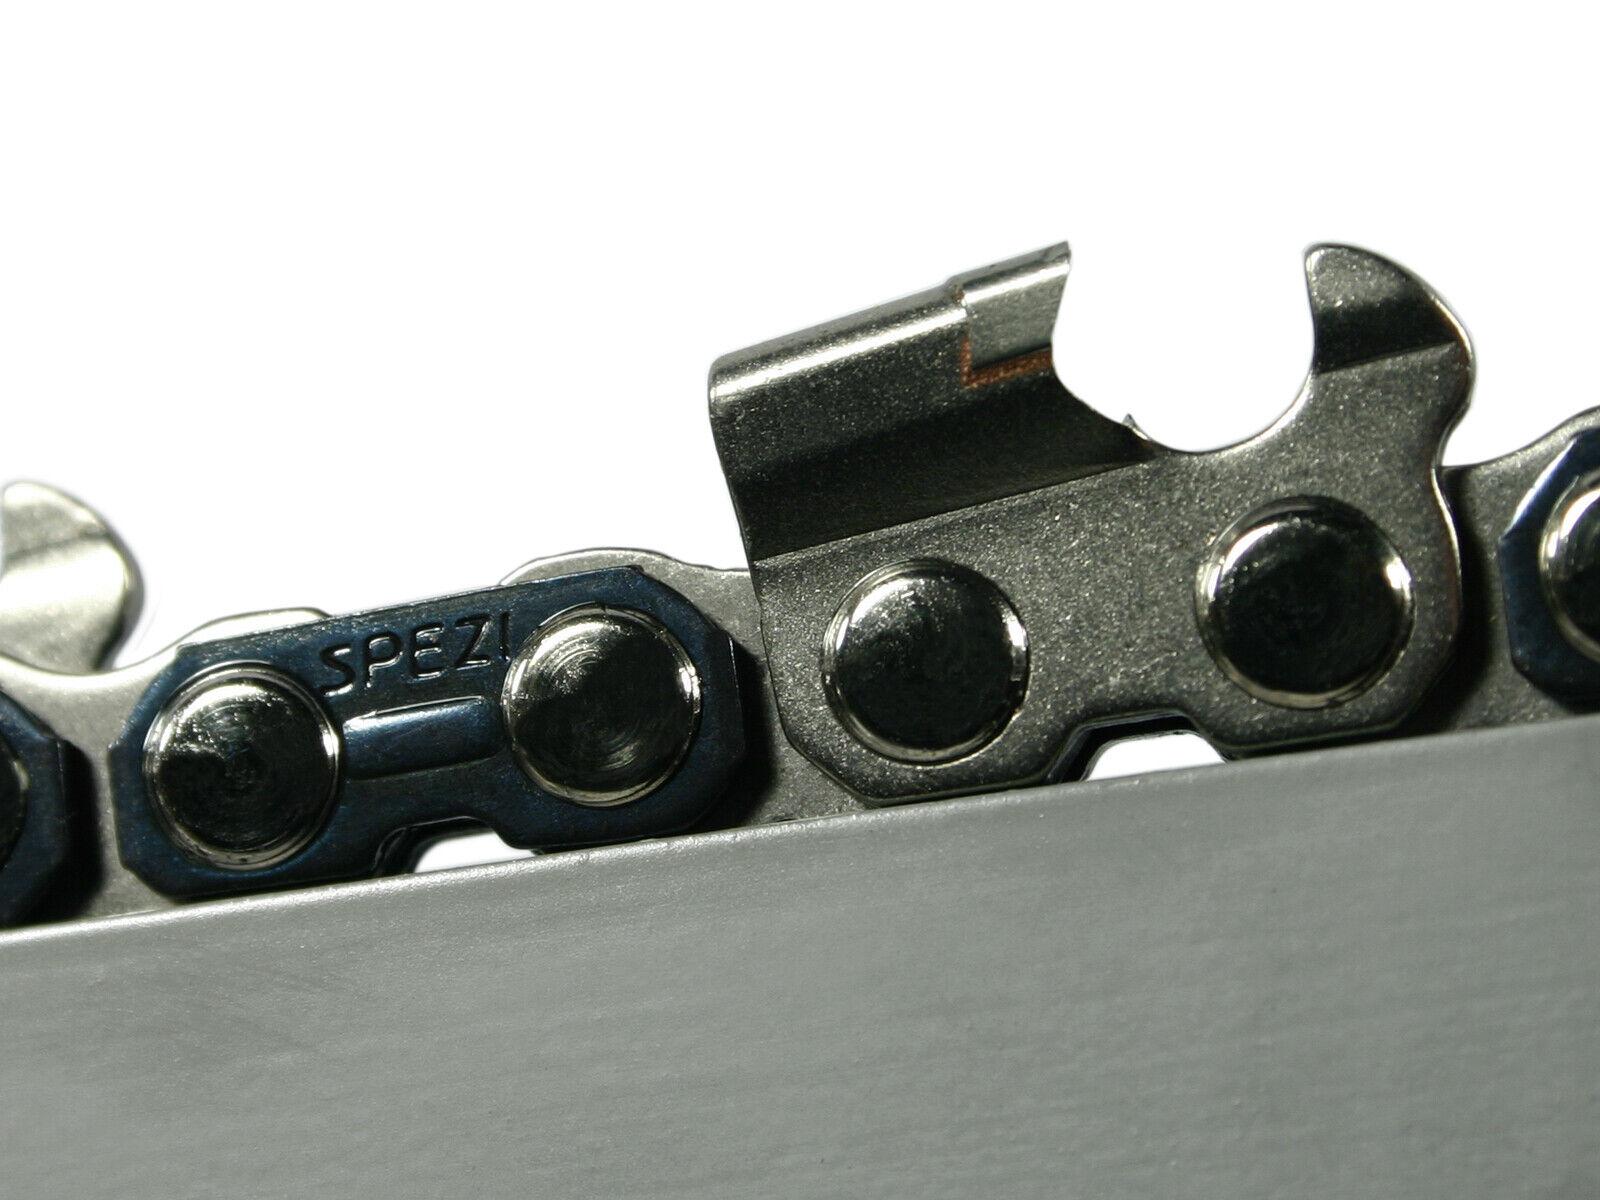 Metal duro cadena sierra adecuado para Husqvarna 3120 90 cm 3 8  115 TG 1,6 mm Cochebide